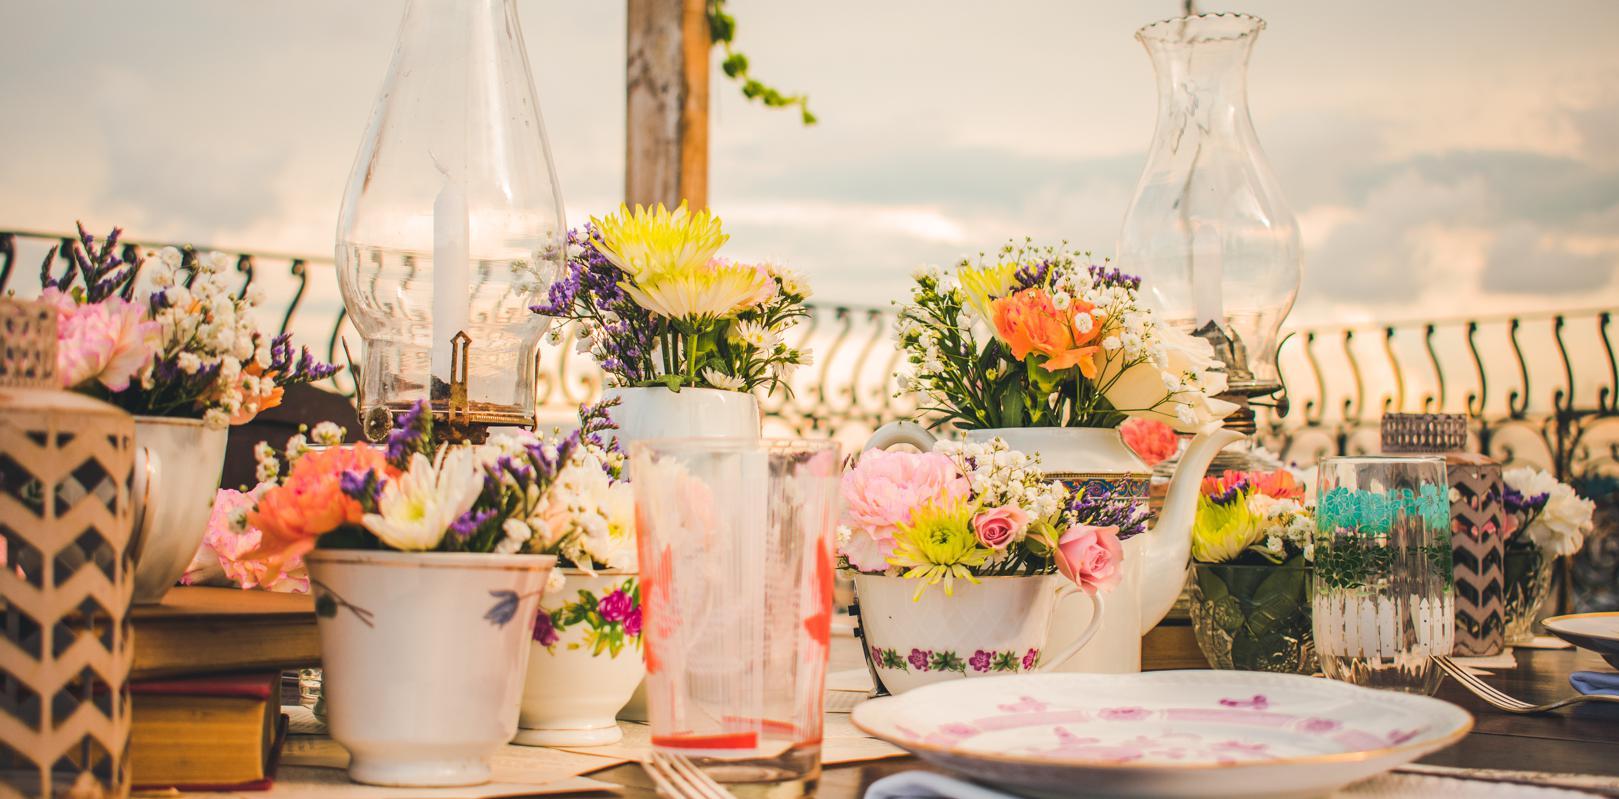 bodas-sin-clasificar-sin-tema-cuba-42522.jpg